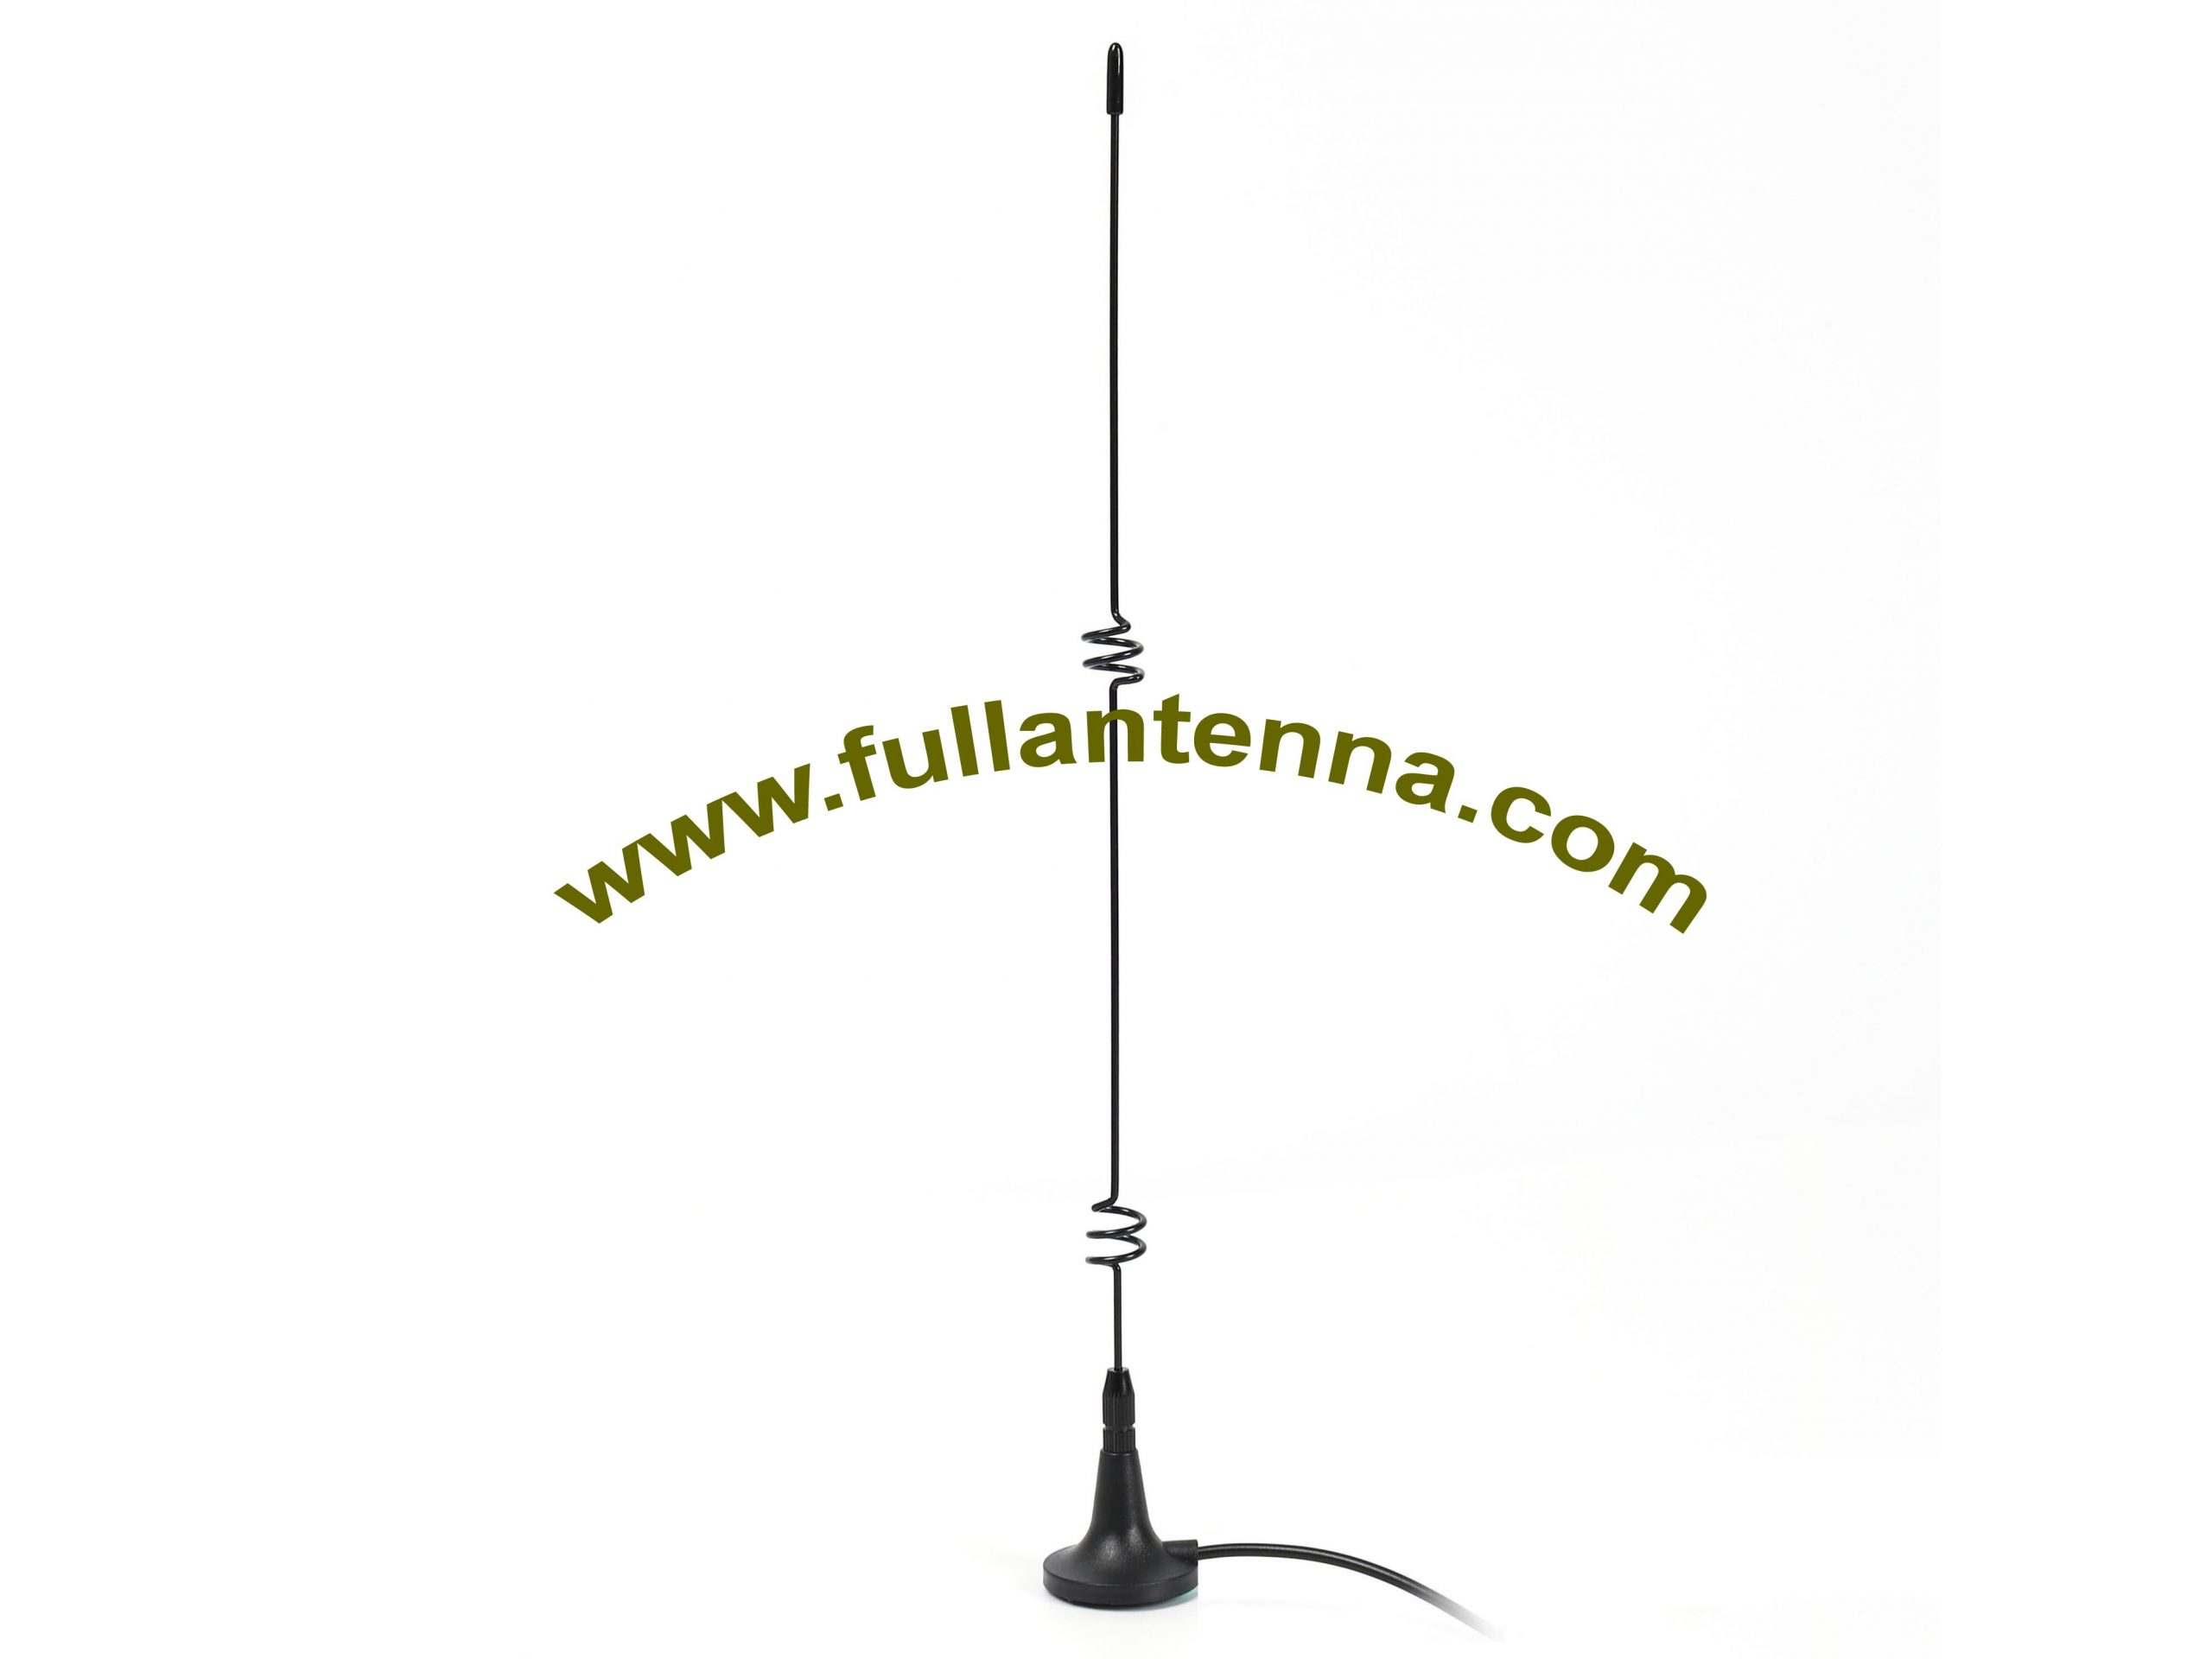 P/N:FA3G.0601,3G External Antenna,small base metal whip high gain TNC or SMC connectors